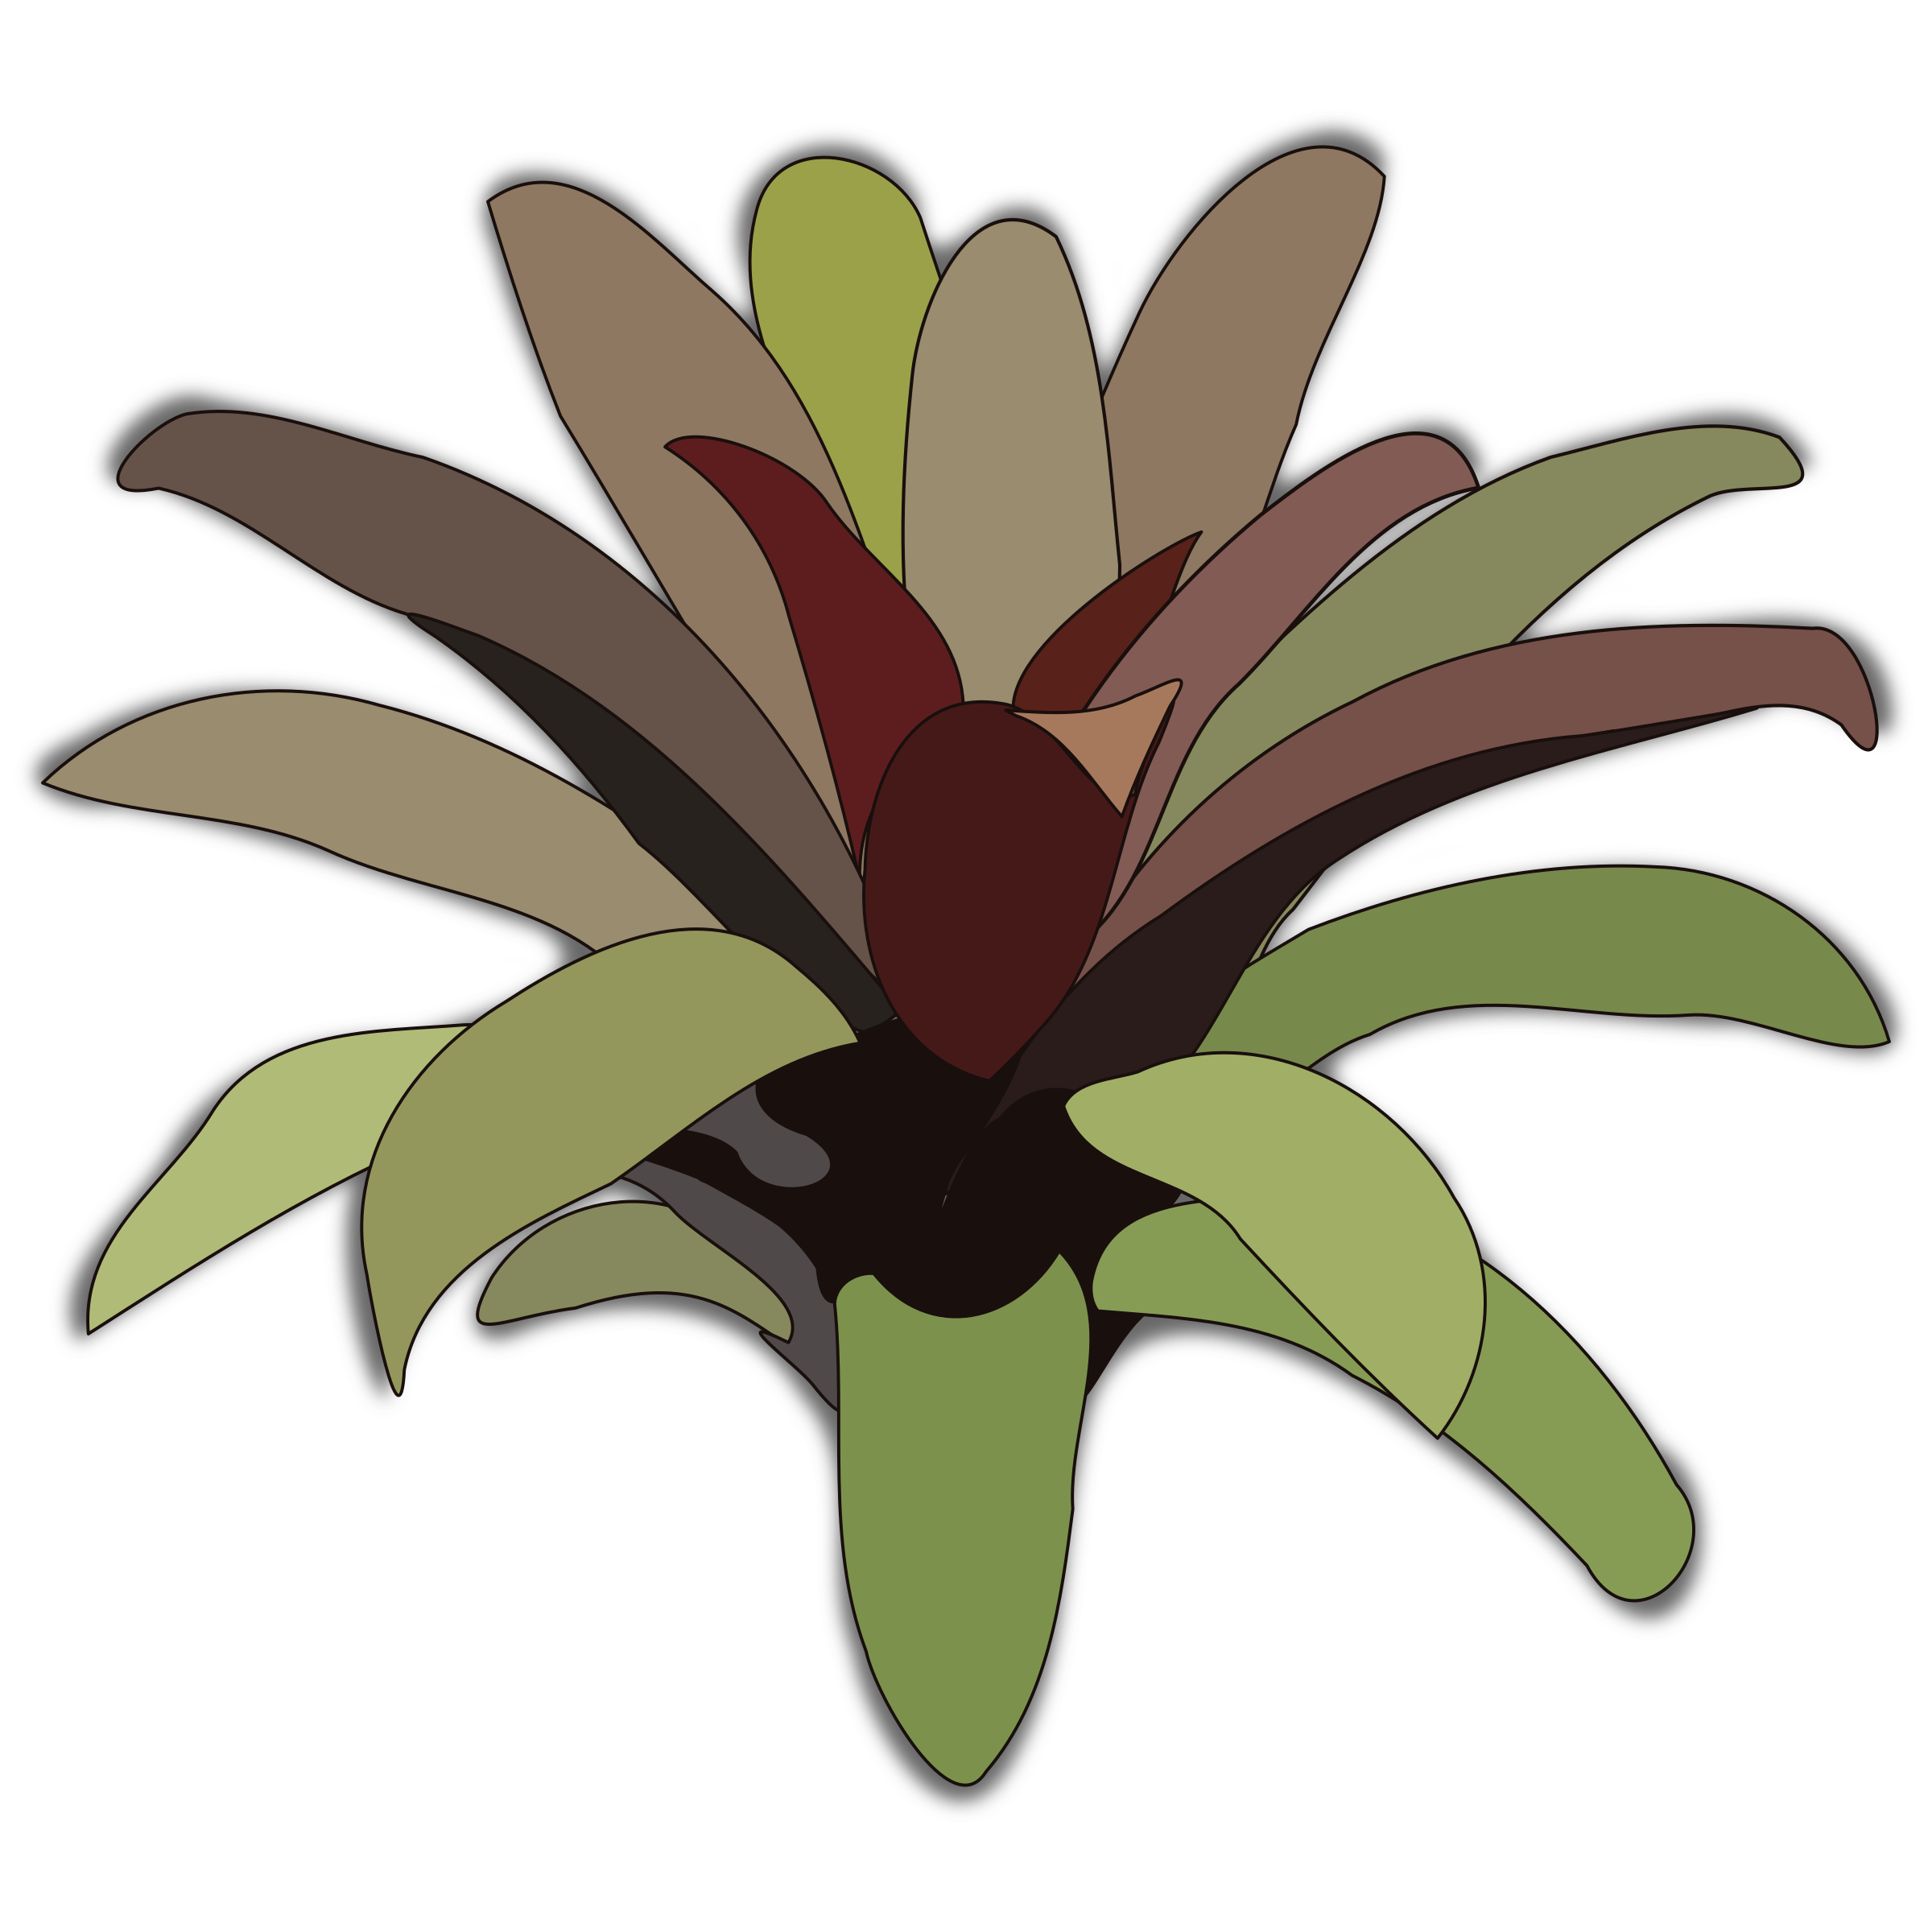 Bromelia svg #18, Download drawings